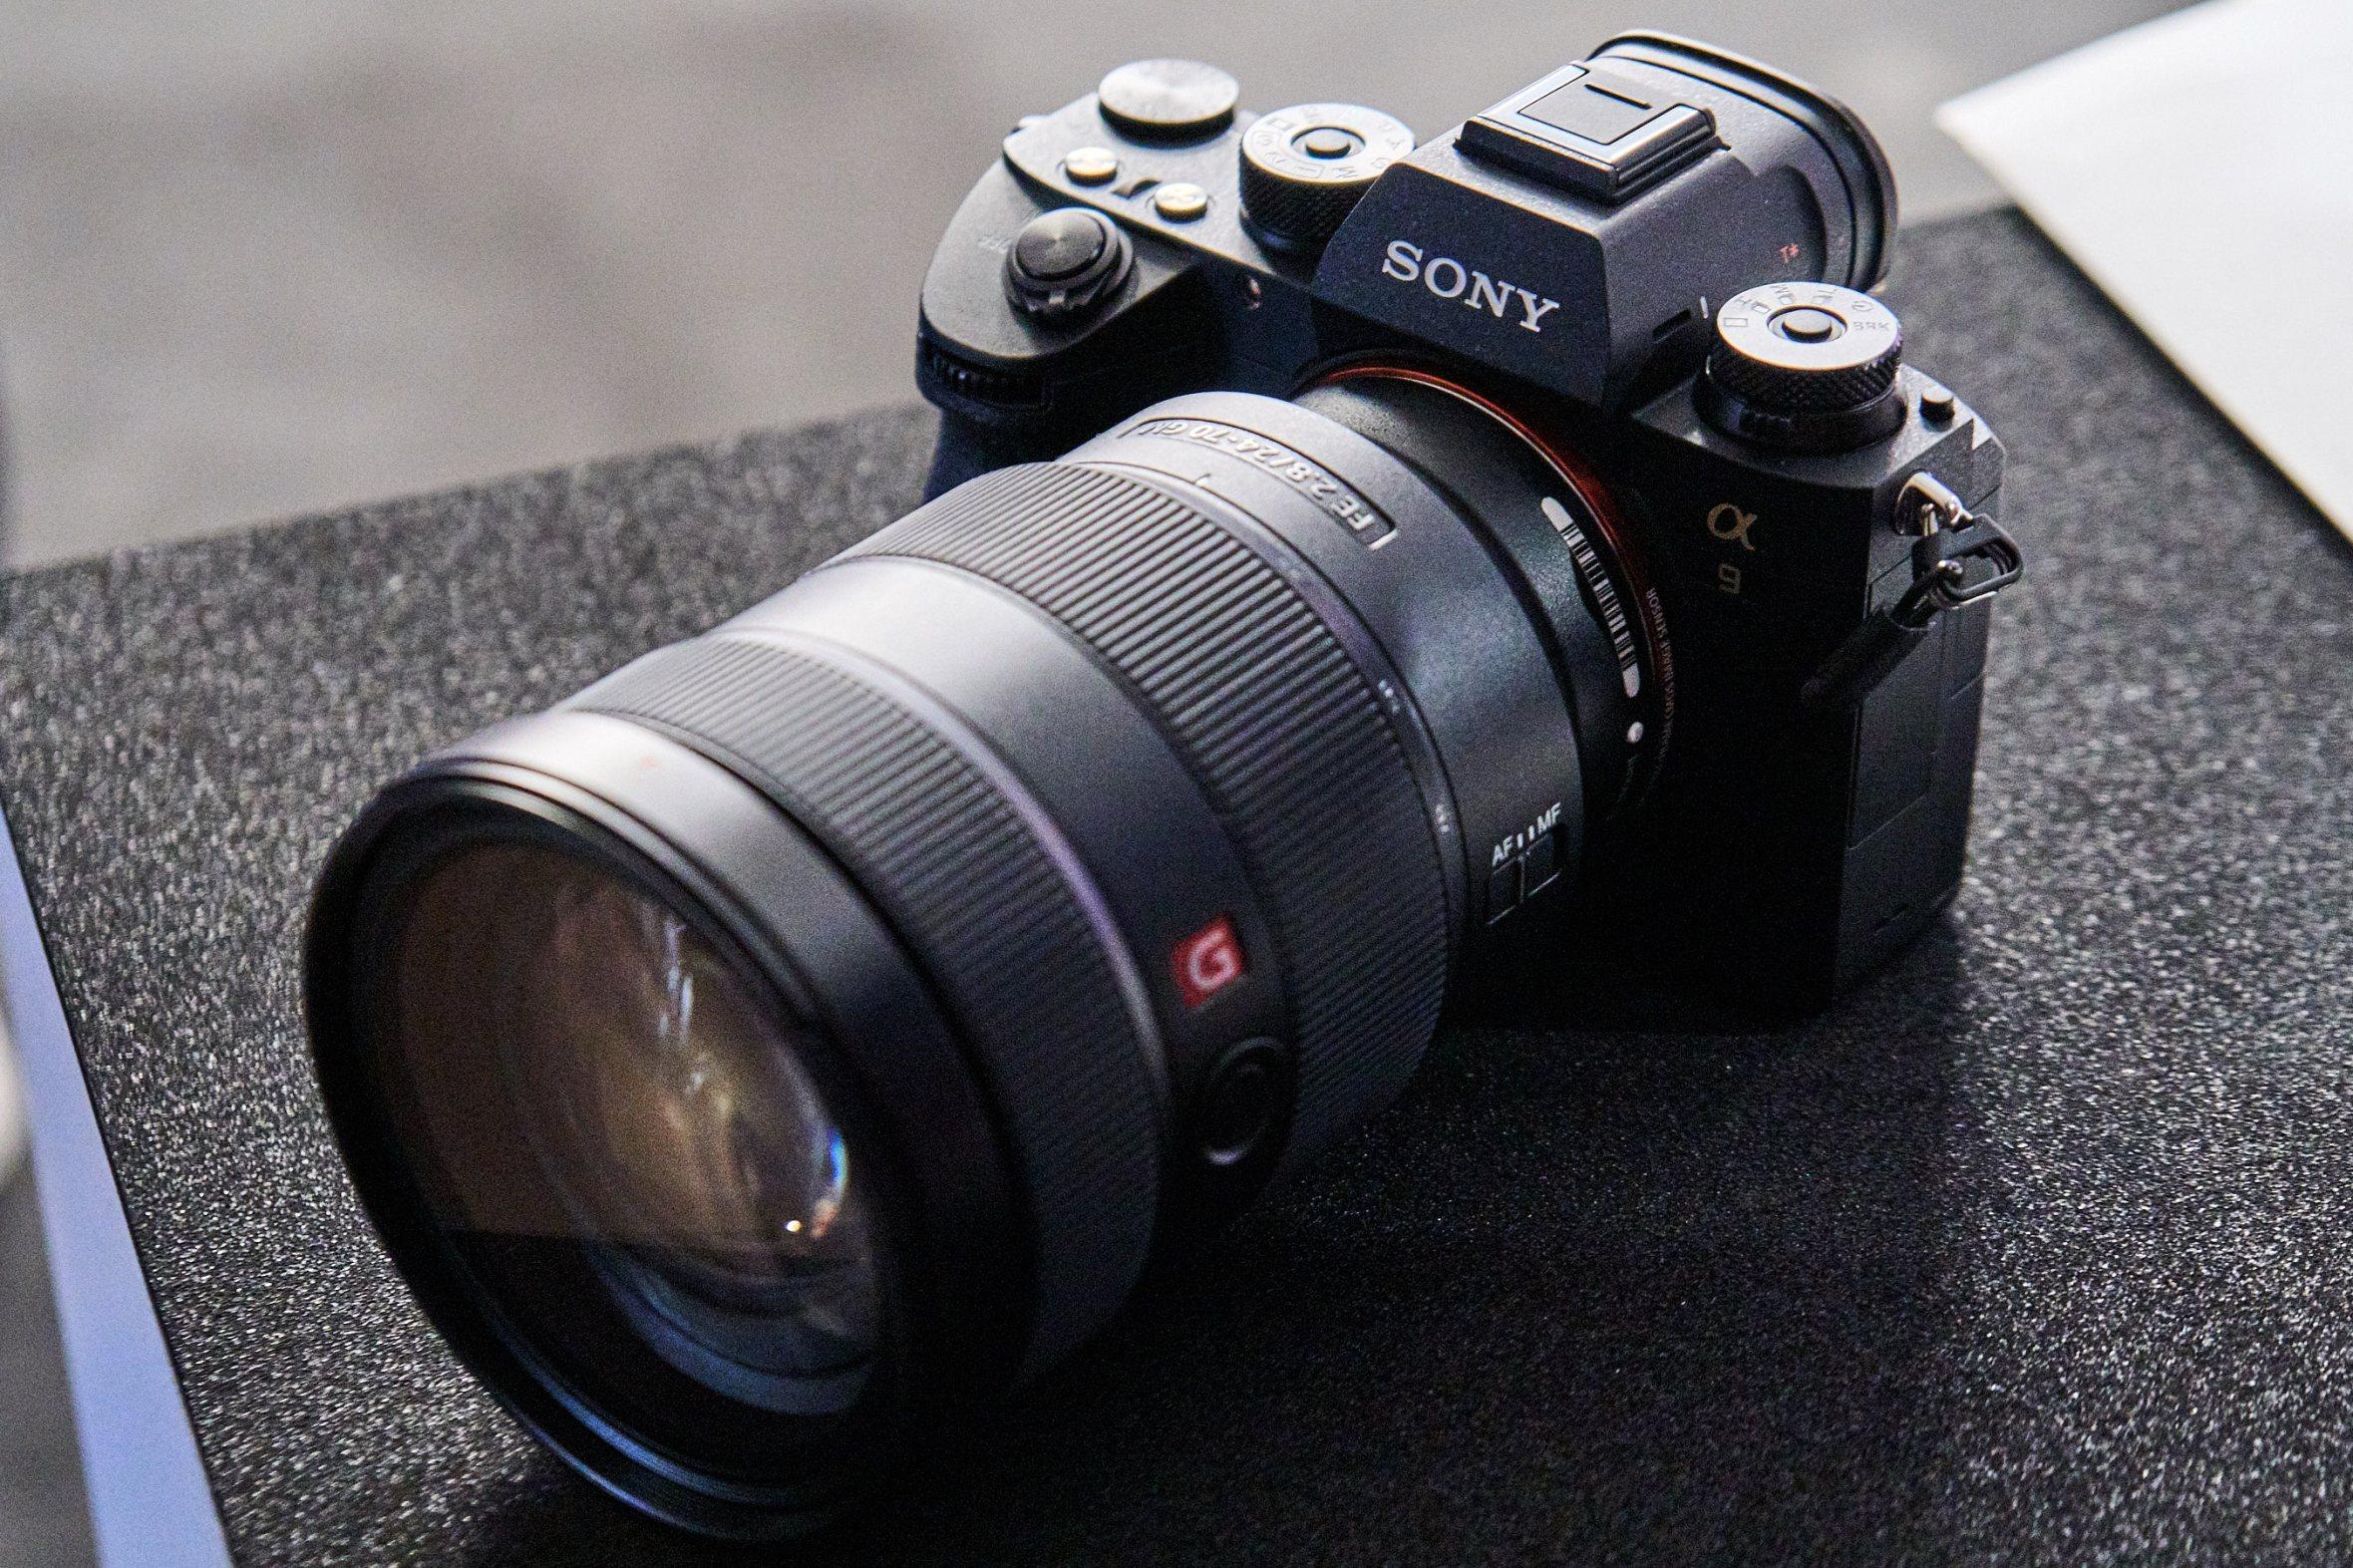 Sony Alpha a9 Mirrorless Camera